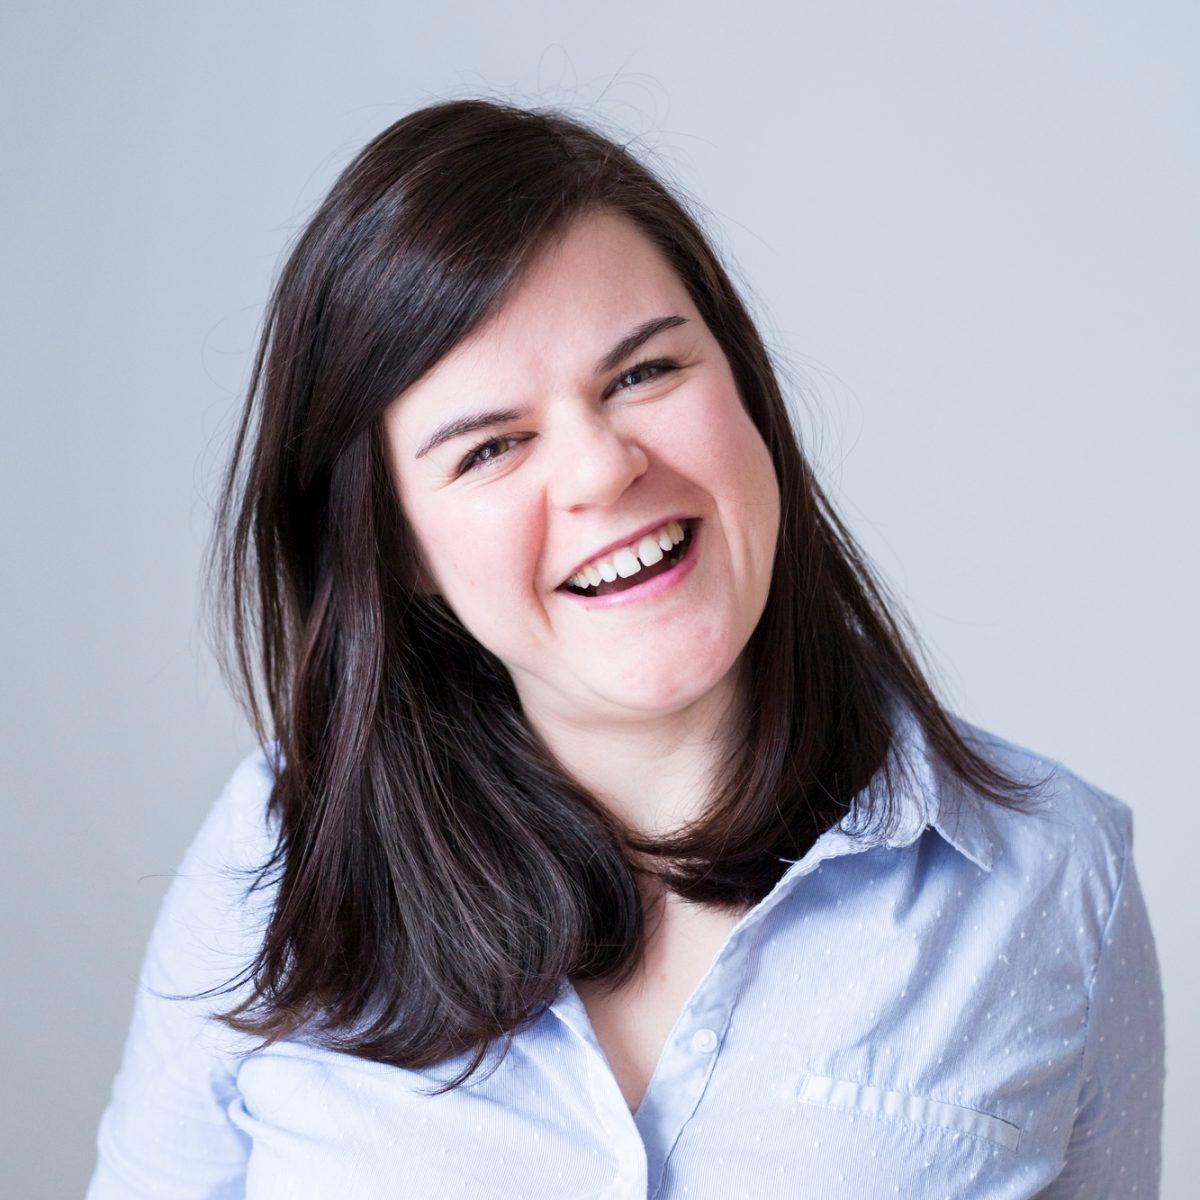 Aurélia Juif Leclerc